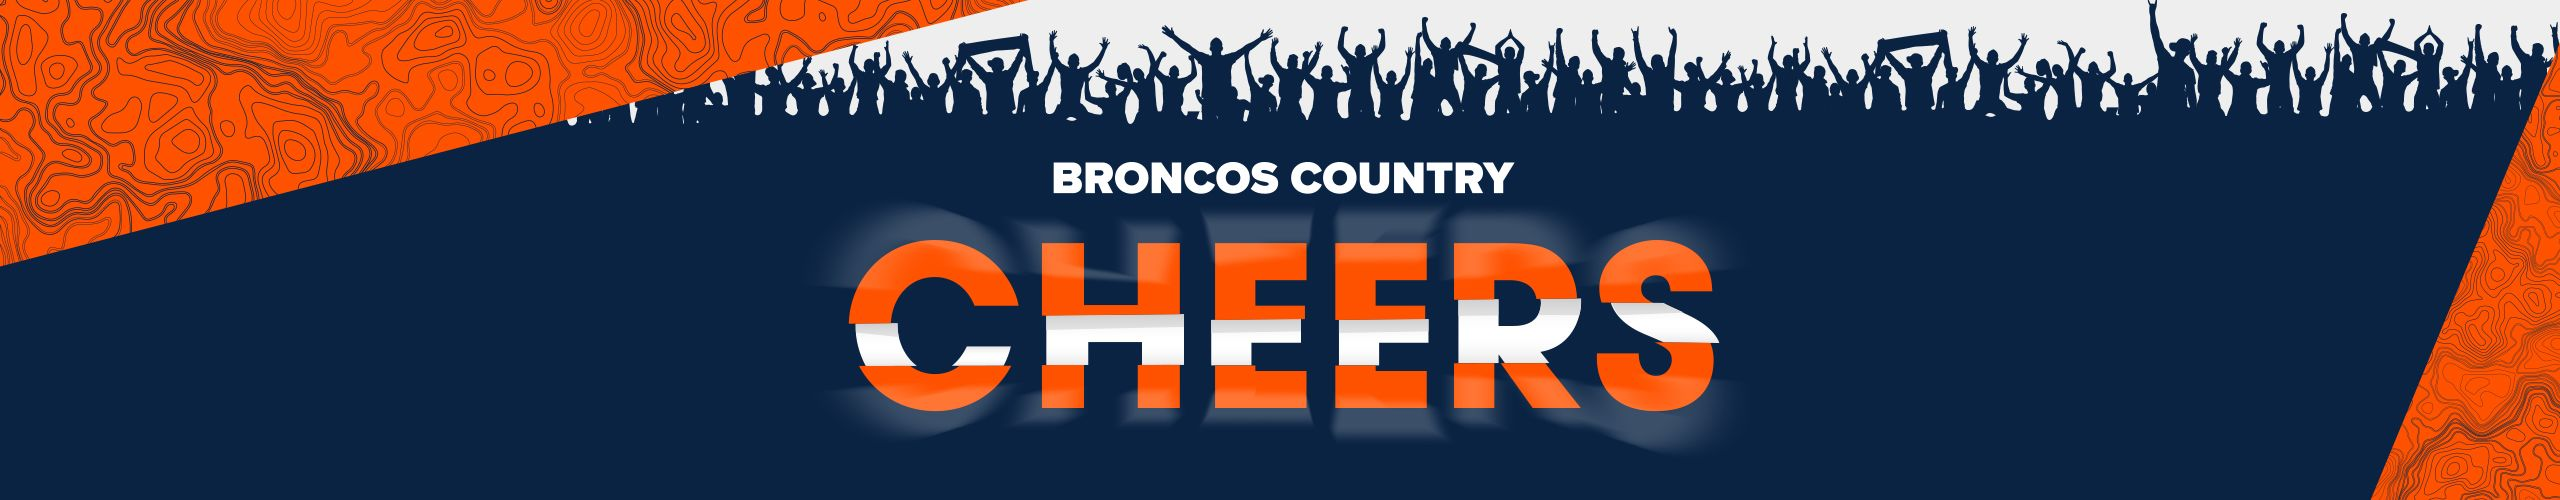 broncos_country_cheers_hero_2560x500